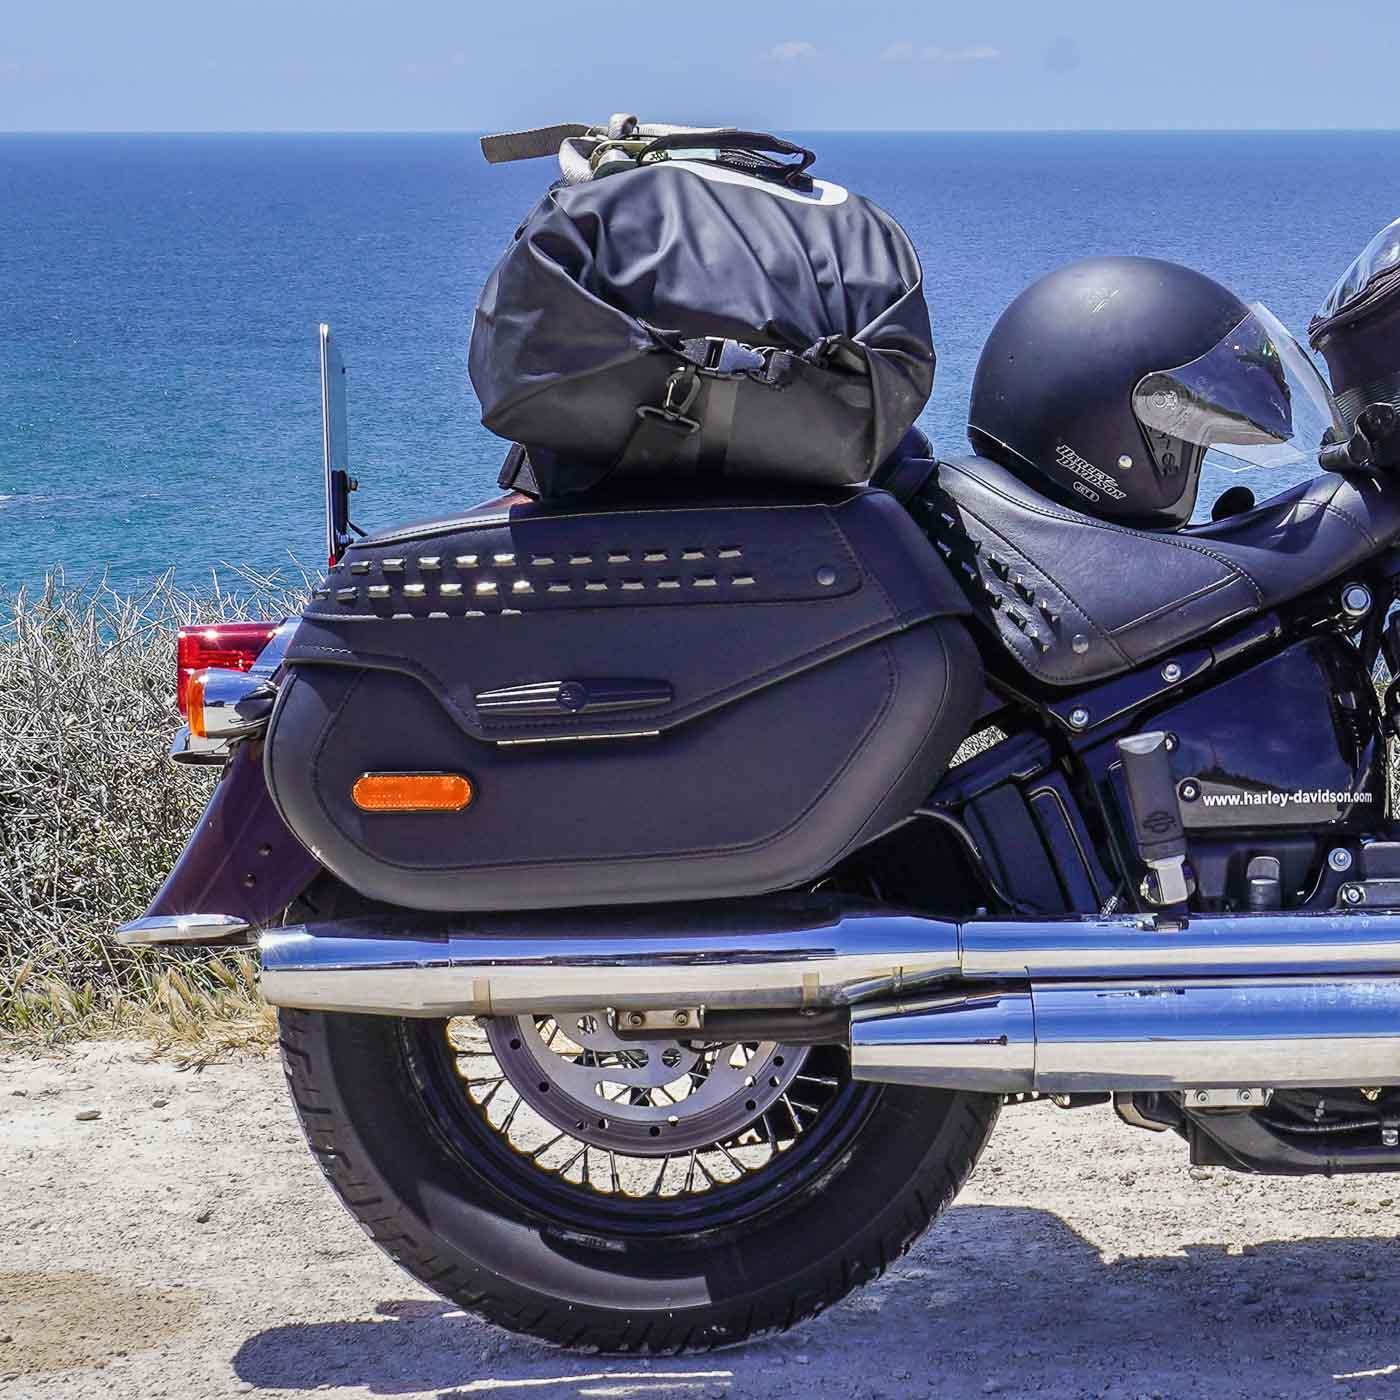 1-Harley-Davidson Heritage Classic 114 2019-A7300150-2